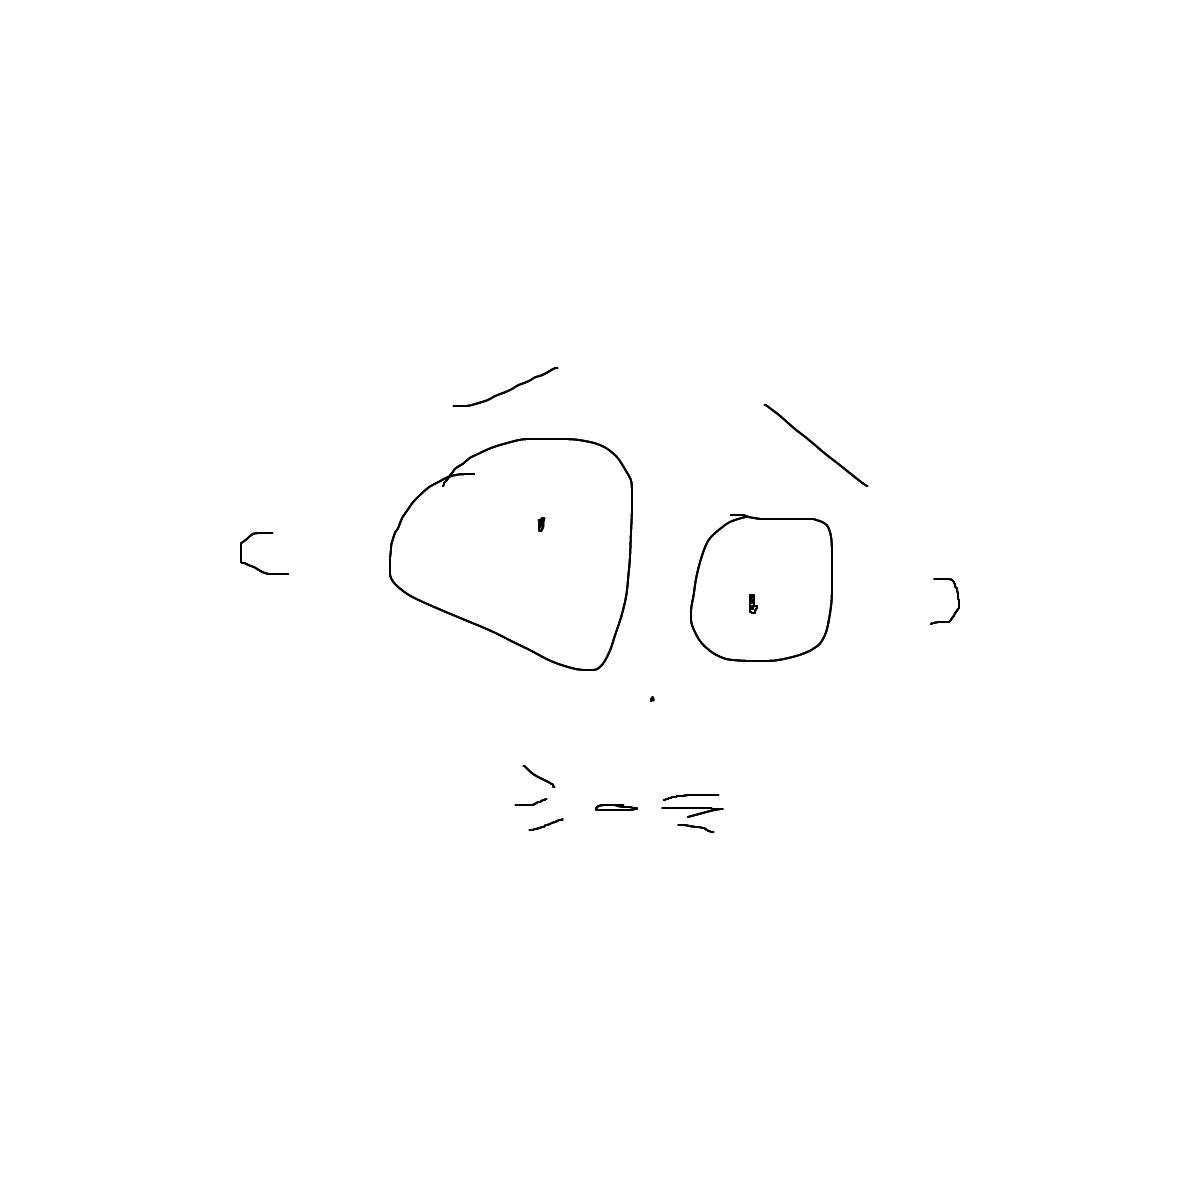 BAAAM drawing#7911 lat:50.9861106872558600lng: 9.6679353713989260